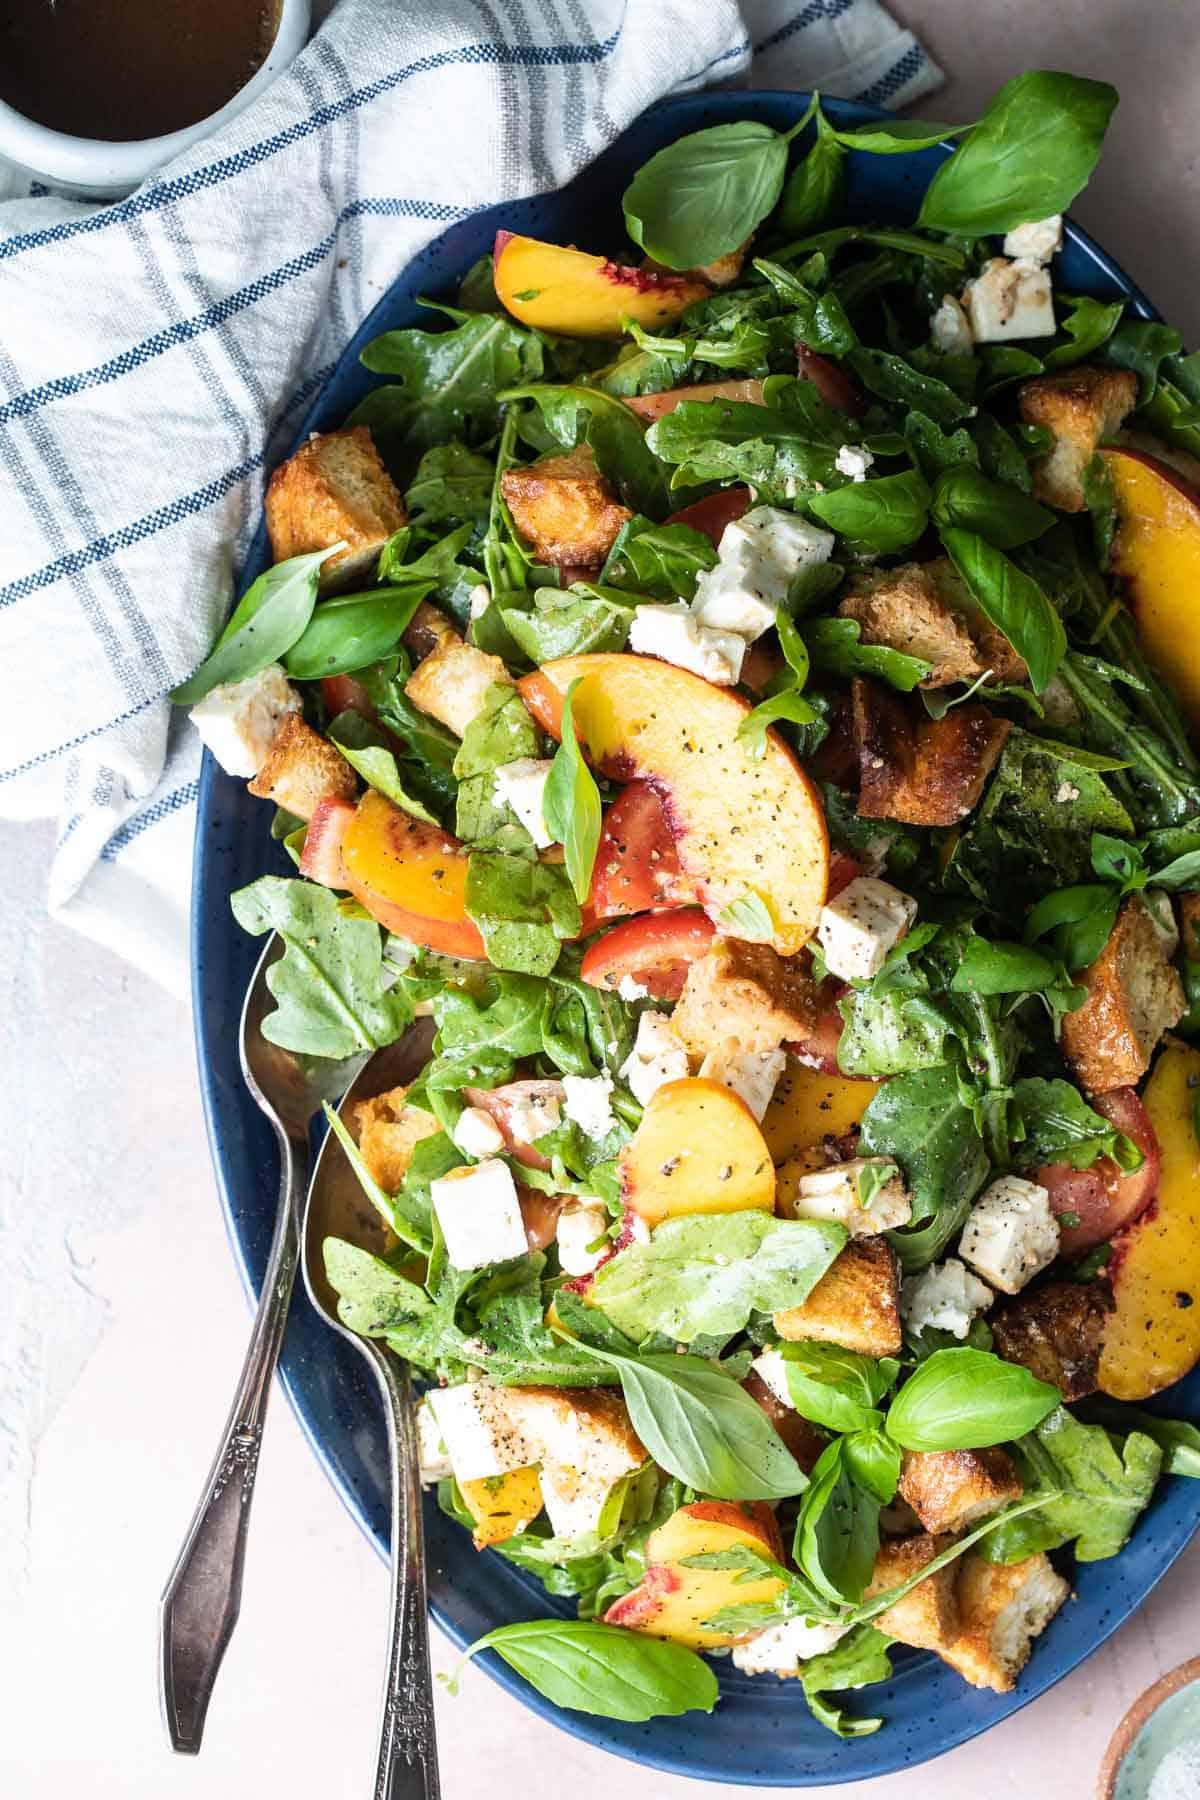 peach and feta panzanella salad with arugula